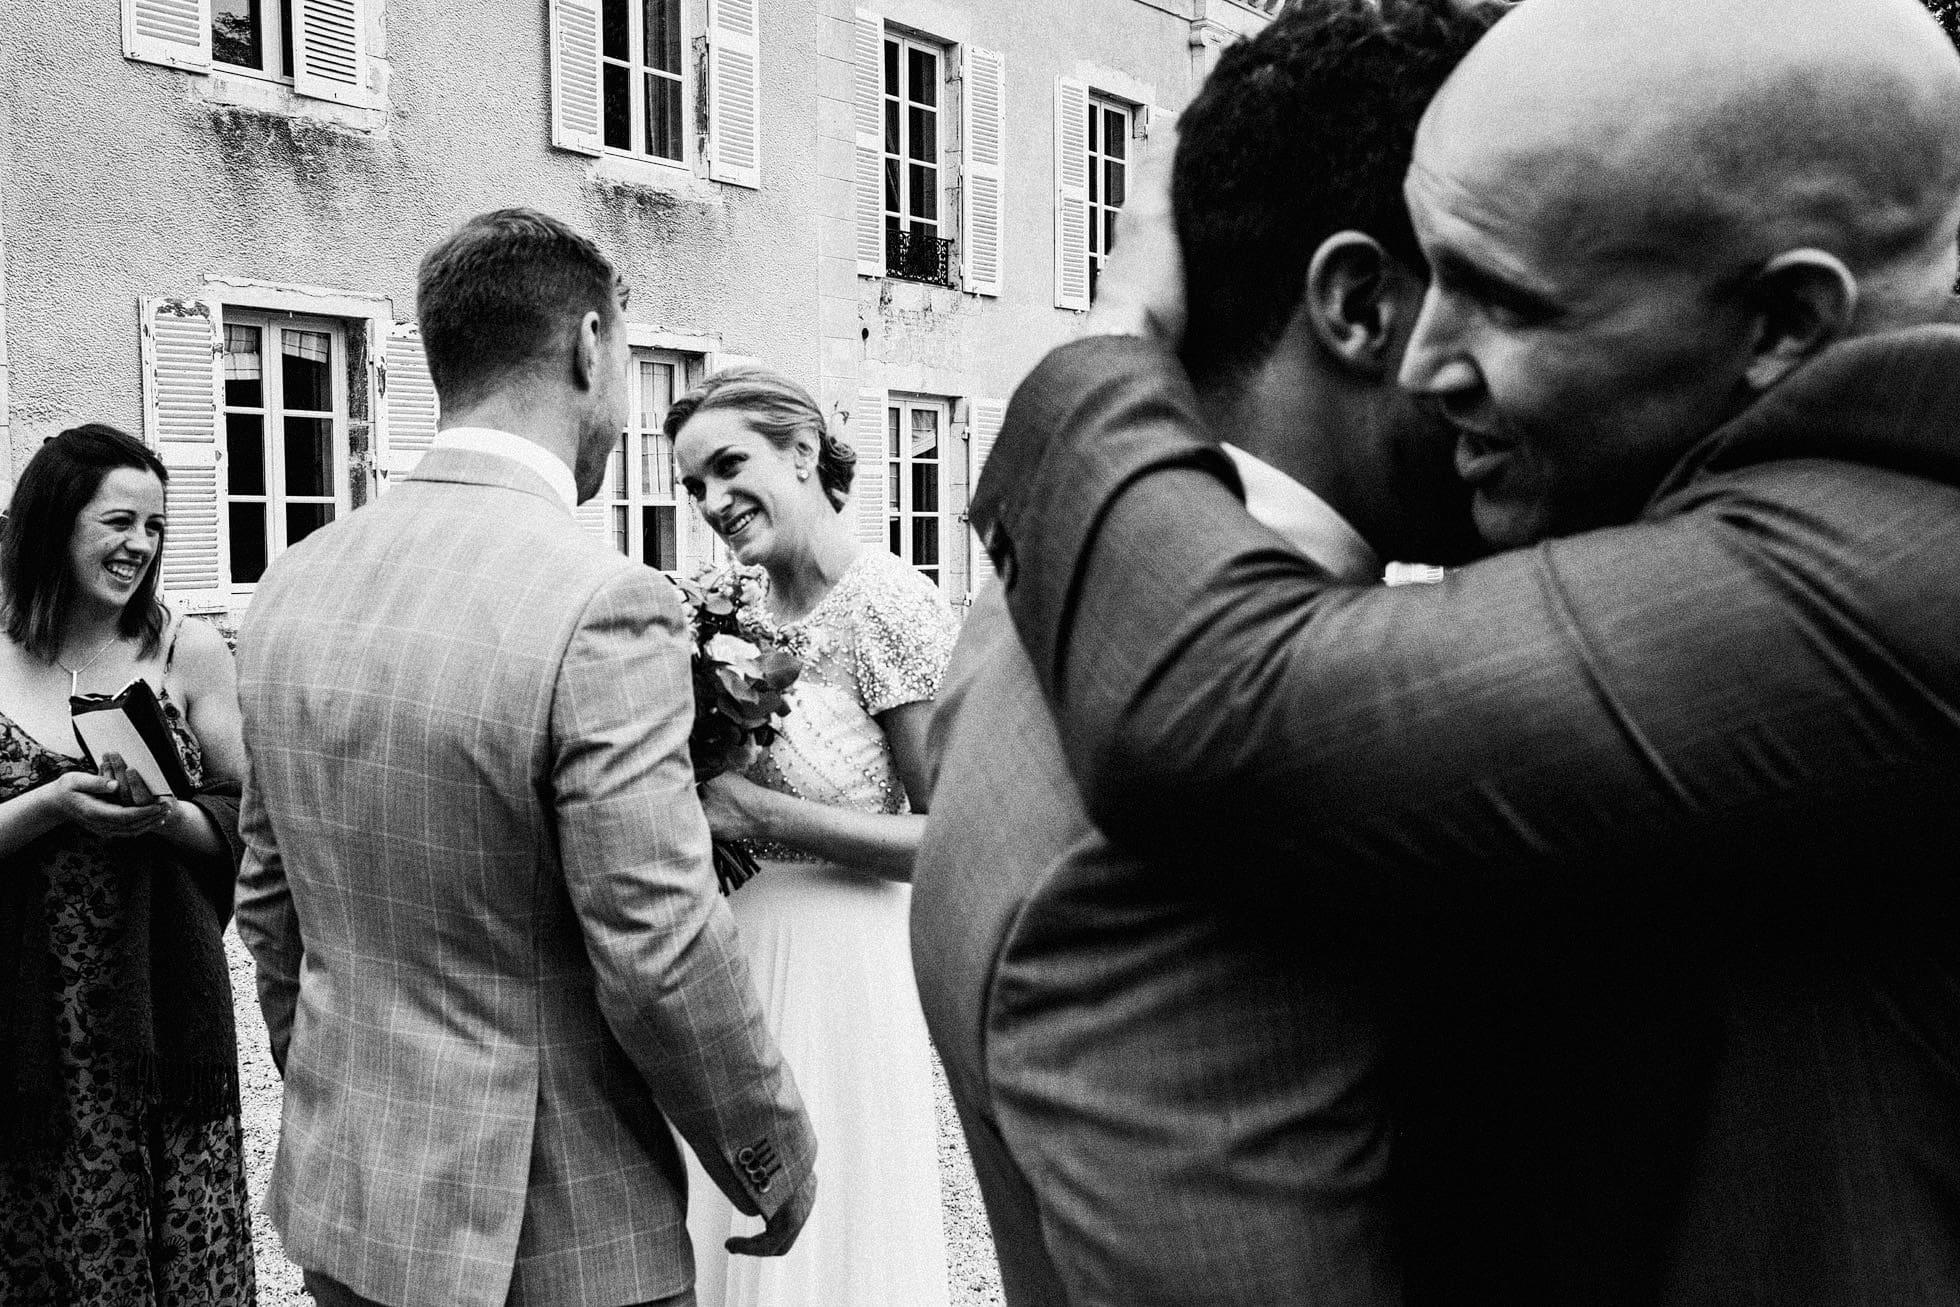 chateau de varennes france wedding